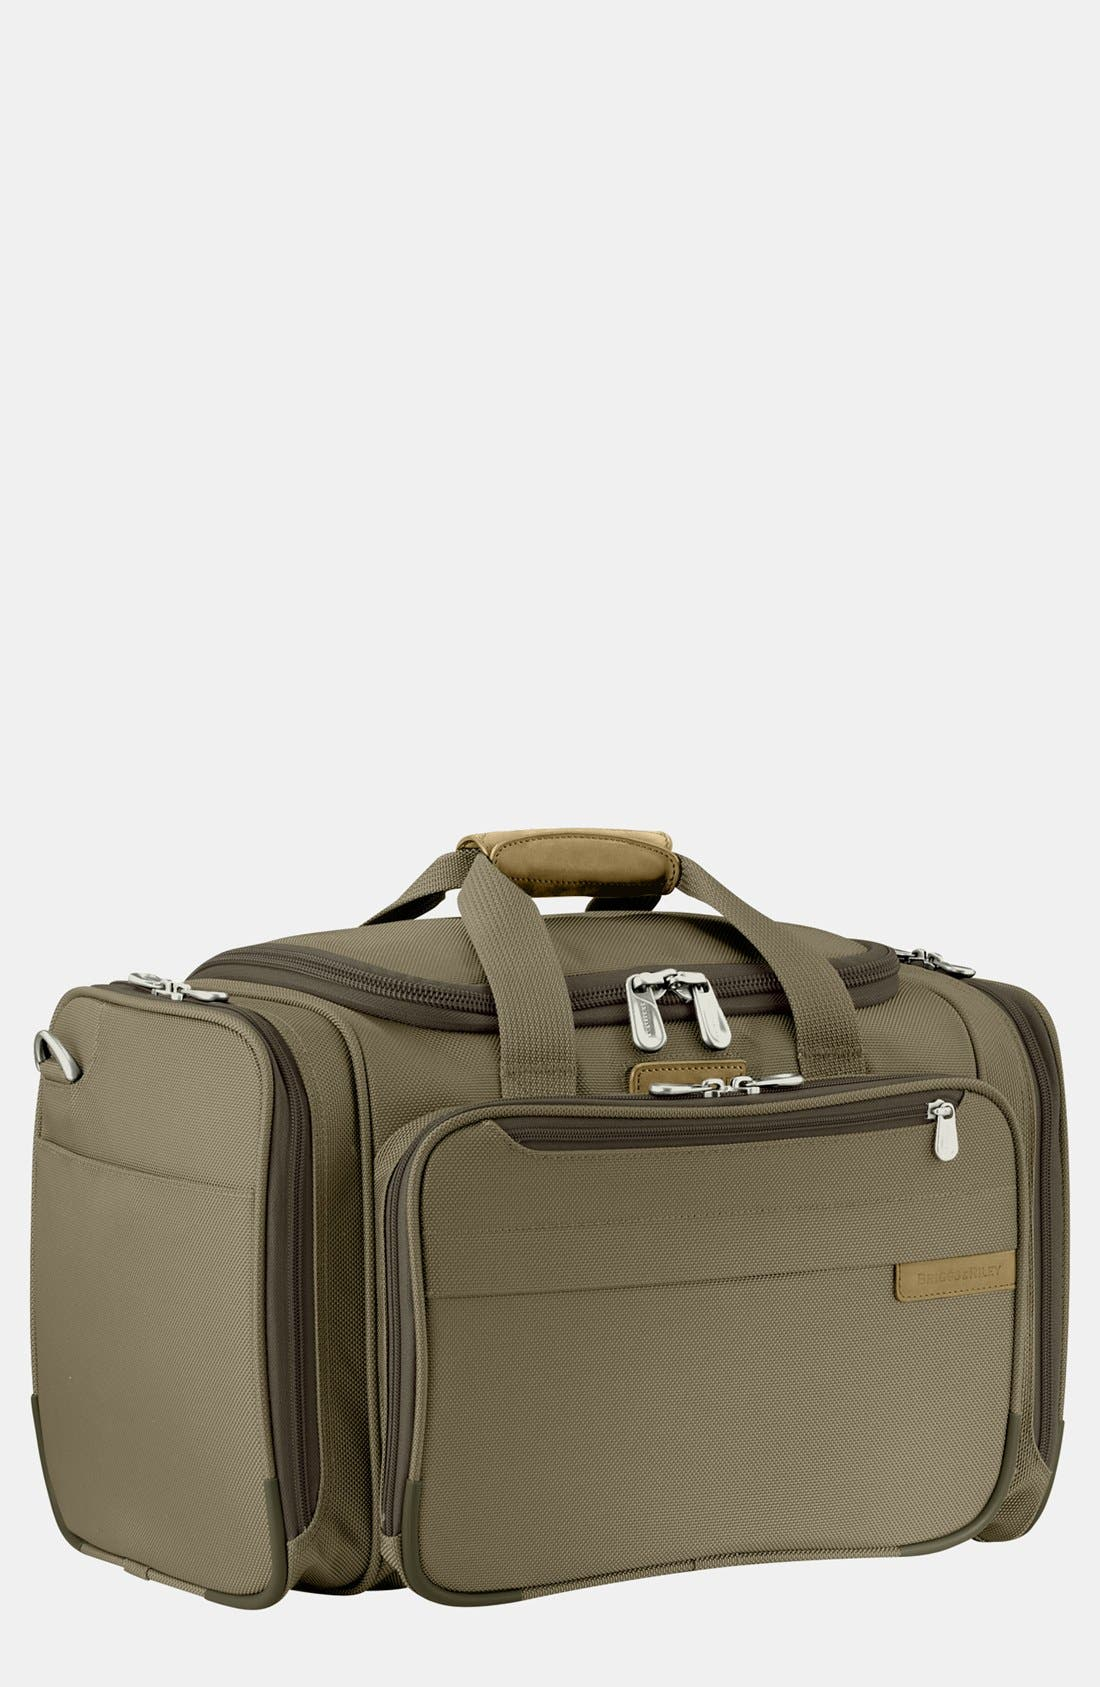 'Baseline - Deluxe' Duffel Bag,                             Main thumbnail 1, color,                             Olive